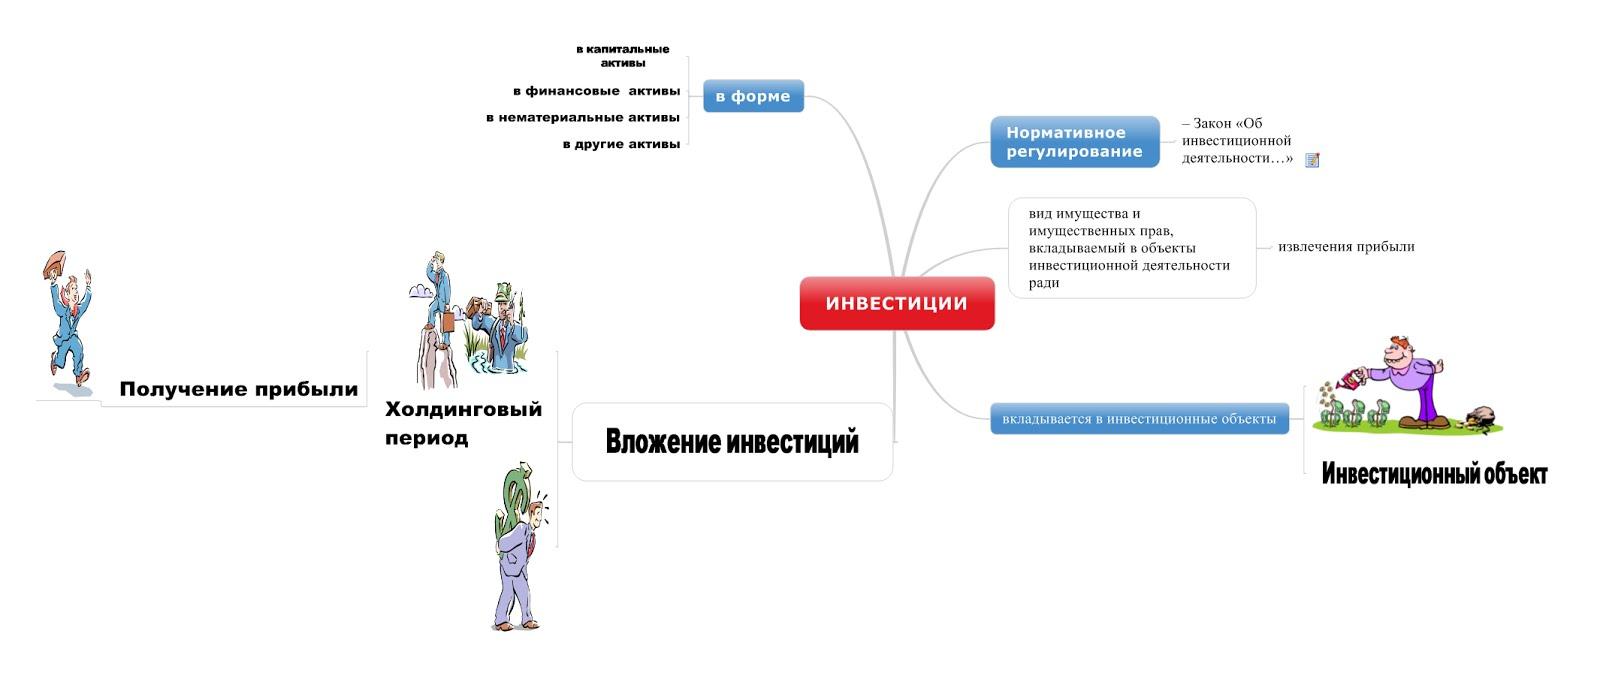 Дмитрий артемьенко трейдер